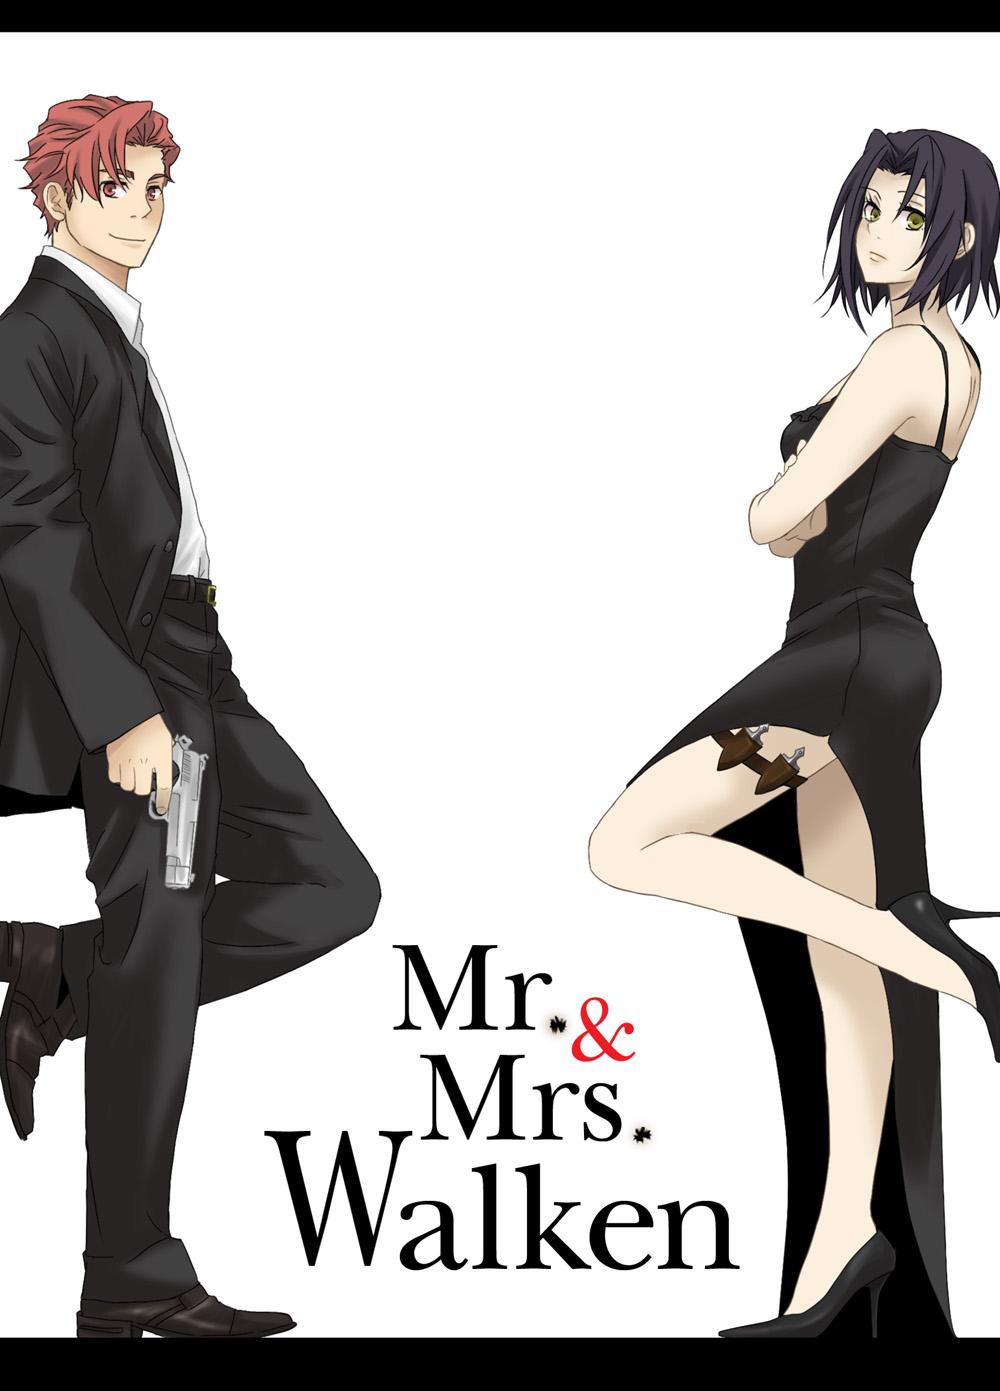 Very Cute Couple Wallpaper Mr Amp Mrs Smith Parody Zerochan Anime Image Board